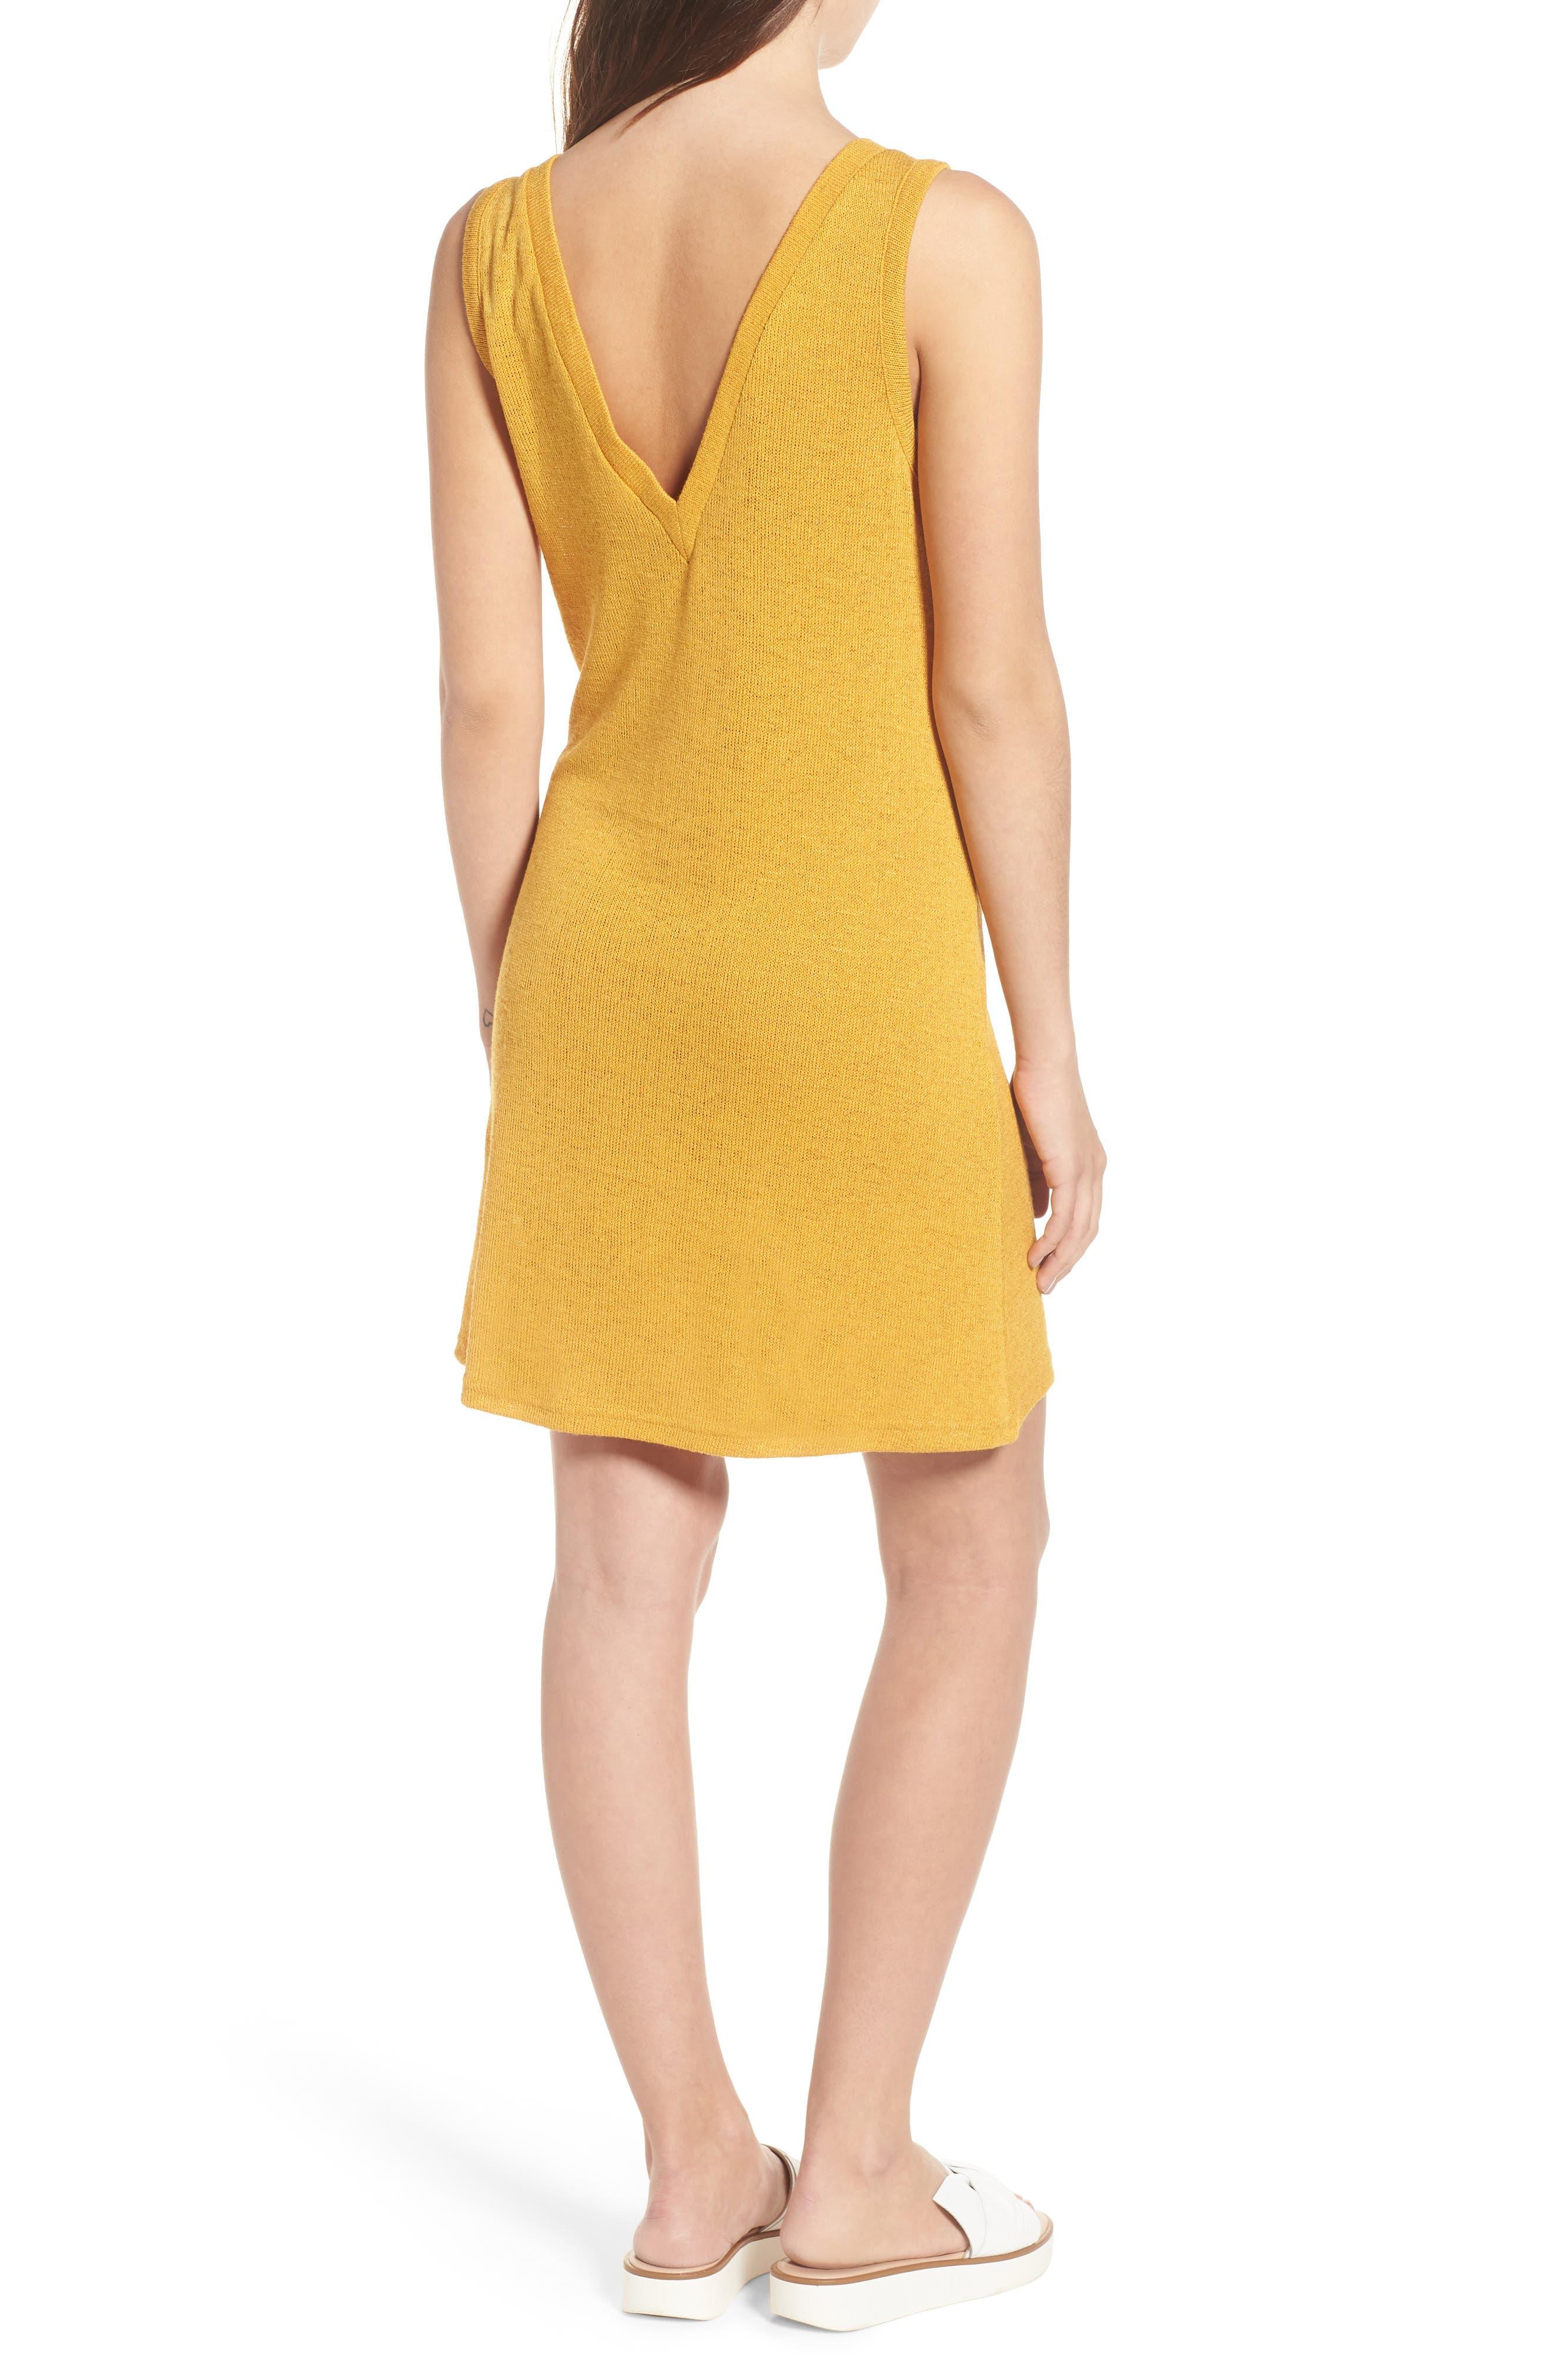 Heat Rising Lace-Up Dress,                             Alternate thumbnail 2, color,                             701